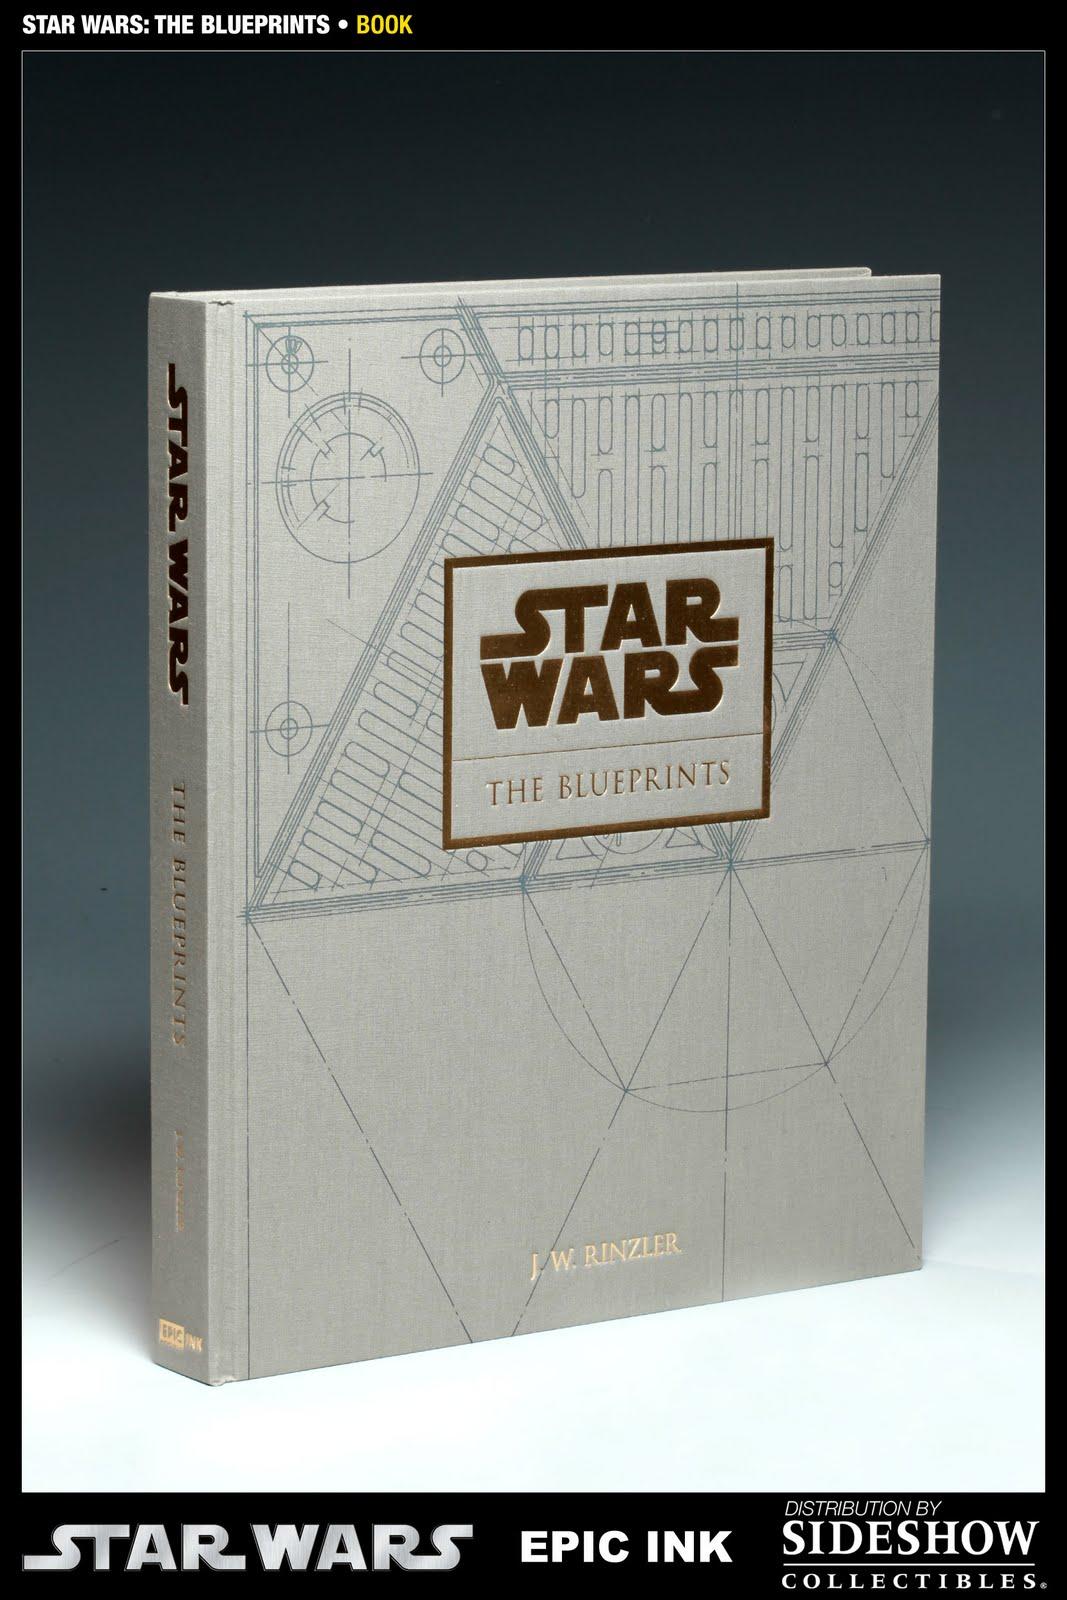 Star wars the blueprints book sg toys star wars the blueprints book malvernweather Choice Image